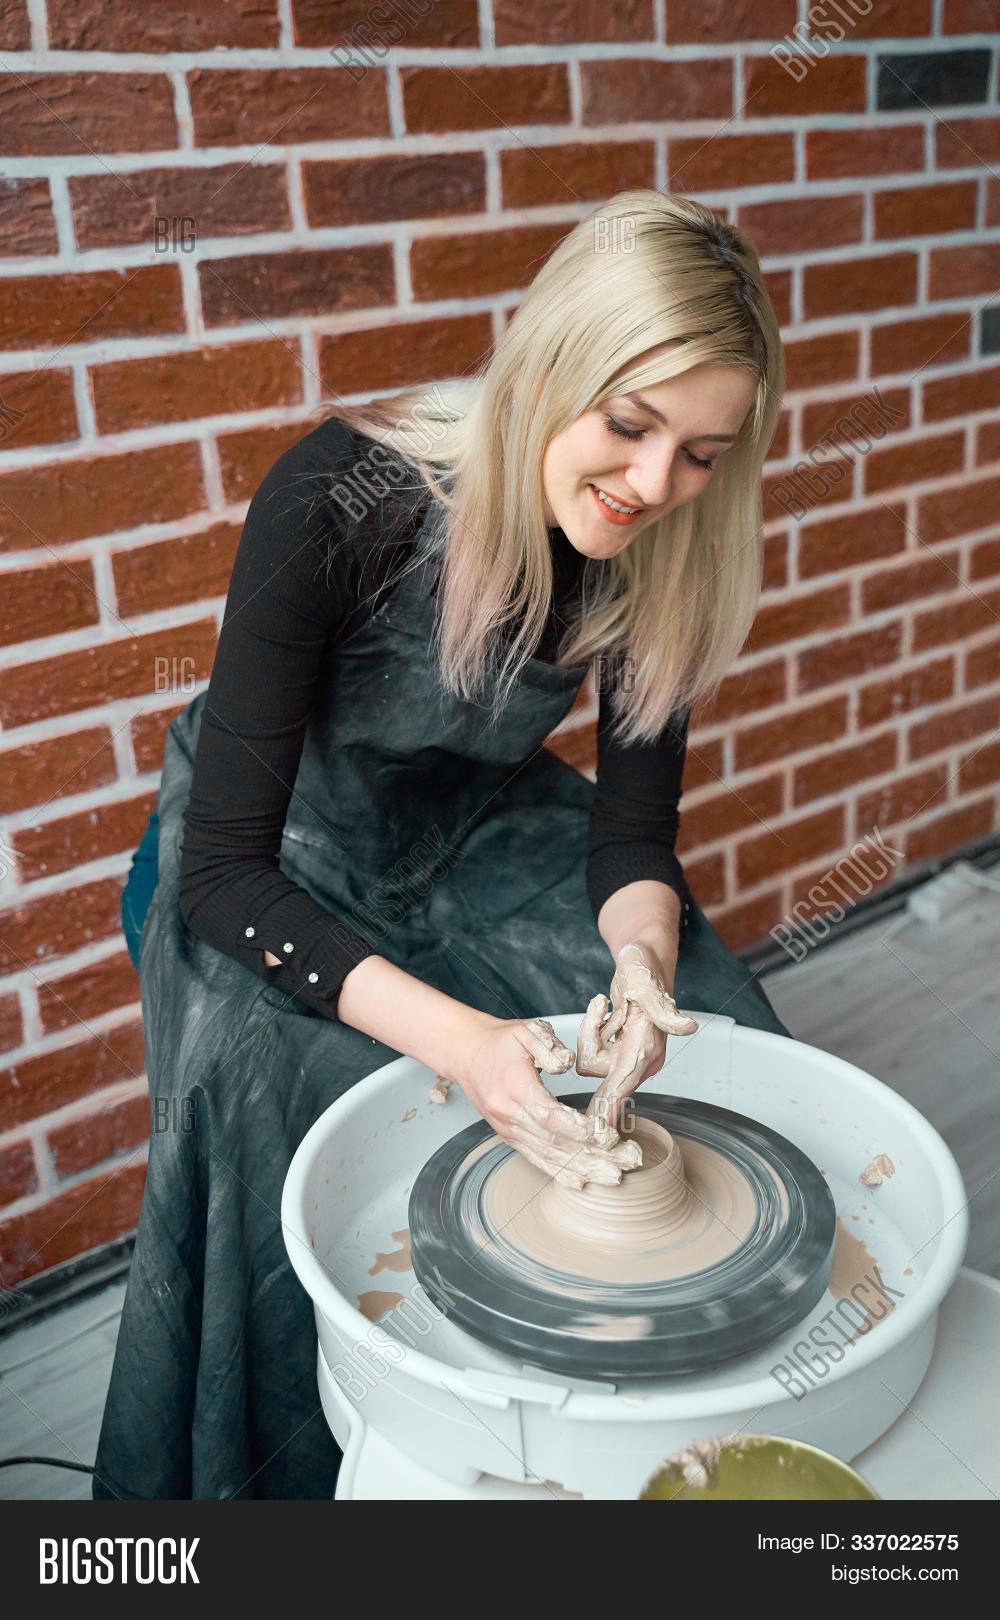 art,artisan,artist,business,ceramic,clay,craft,craftsman,creative,creativity,earthenware,entrepreneurs,female,form,freelance,hand,handcraft,handicraft,handmade,handwork,hobby,ingot,learning,making,master,molding,mud,occupation,people,pot,pottery,sculptor,shape,skill,smile,smiling,turn,vertical,wheel,woman,work,working,workpiece,workshop